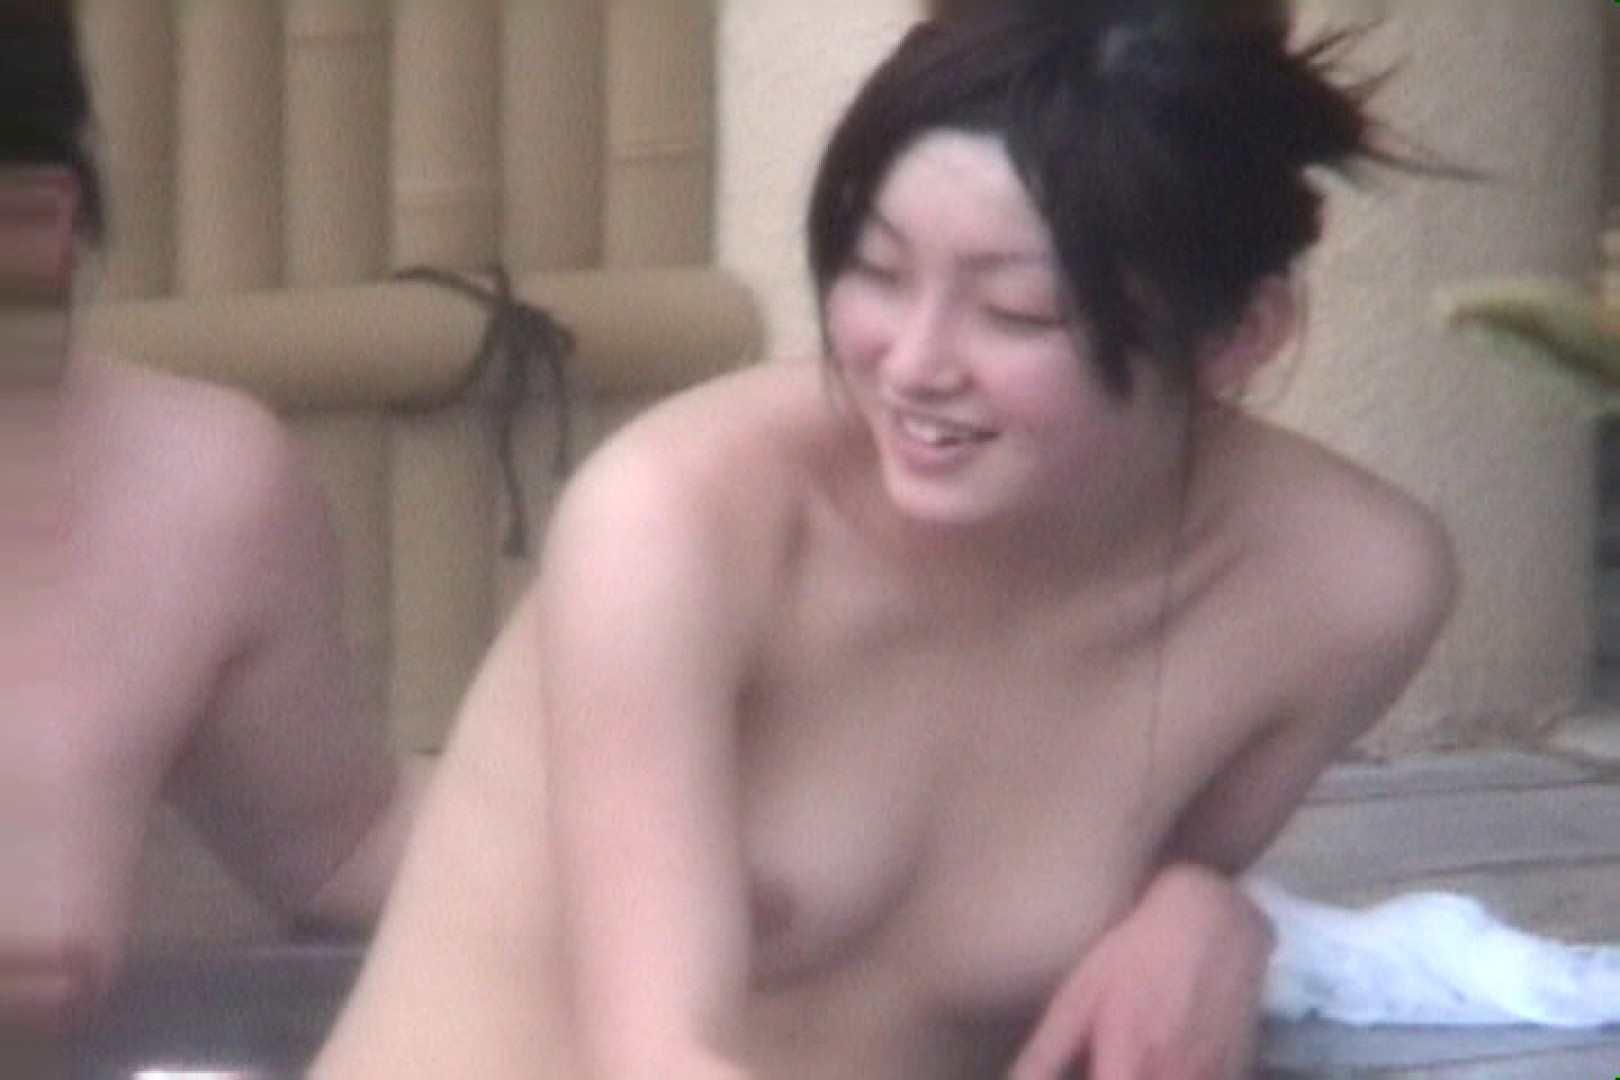 Aquaな露天風呂Vol.44【VIP限定】 露天覗き 盗撮画像 61枚